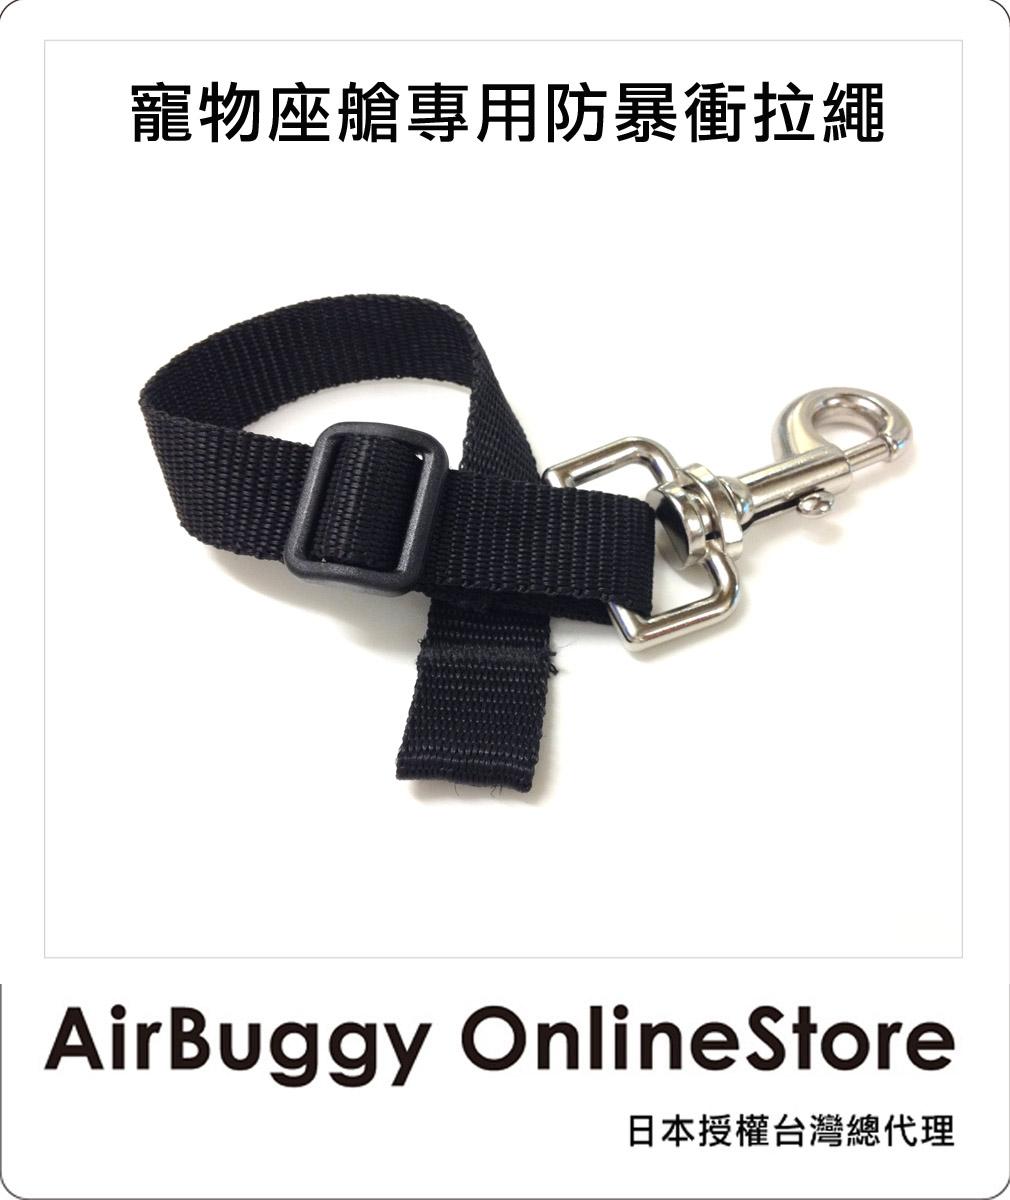 AirBuggy Dome寵物座艙專用防暴衝拉繩